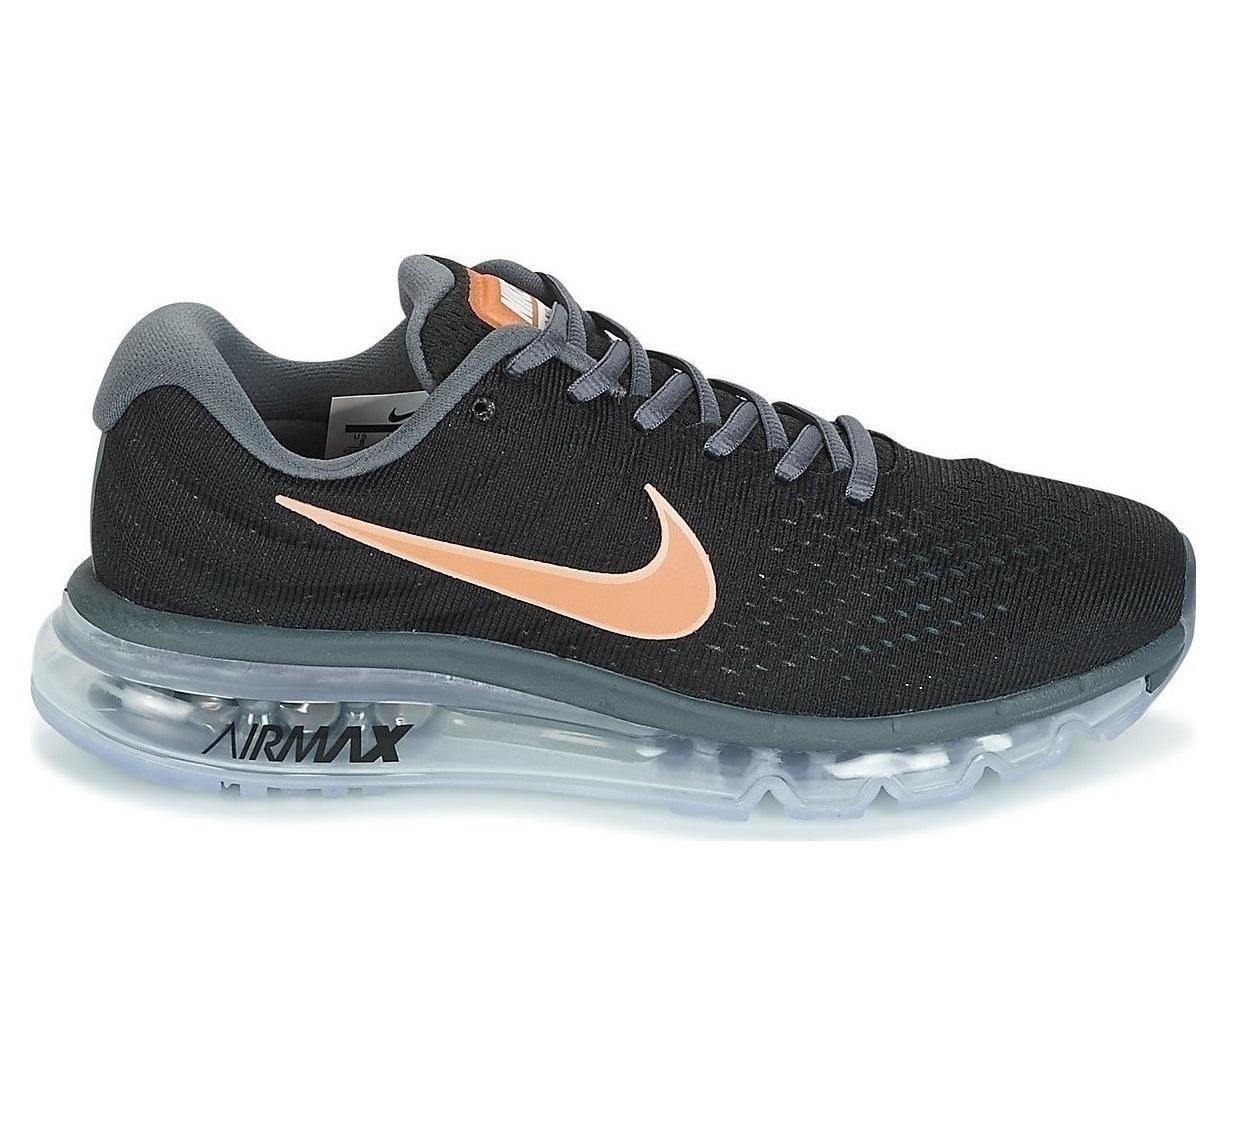 donna air air air max nike 2017 nerone scarpe da corsa 849560 008 | Moderno Ed Elegante A Moda  | Maschio/Ragazze Scarpa  2dea9b